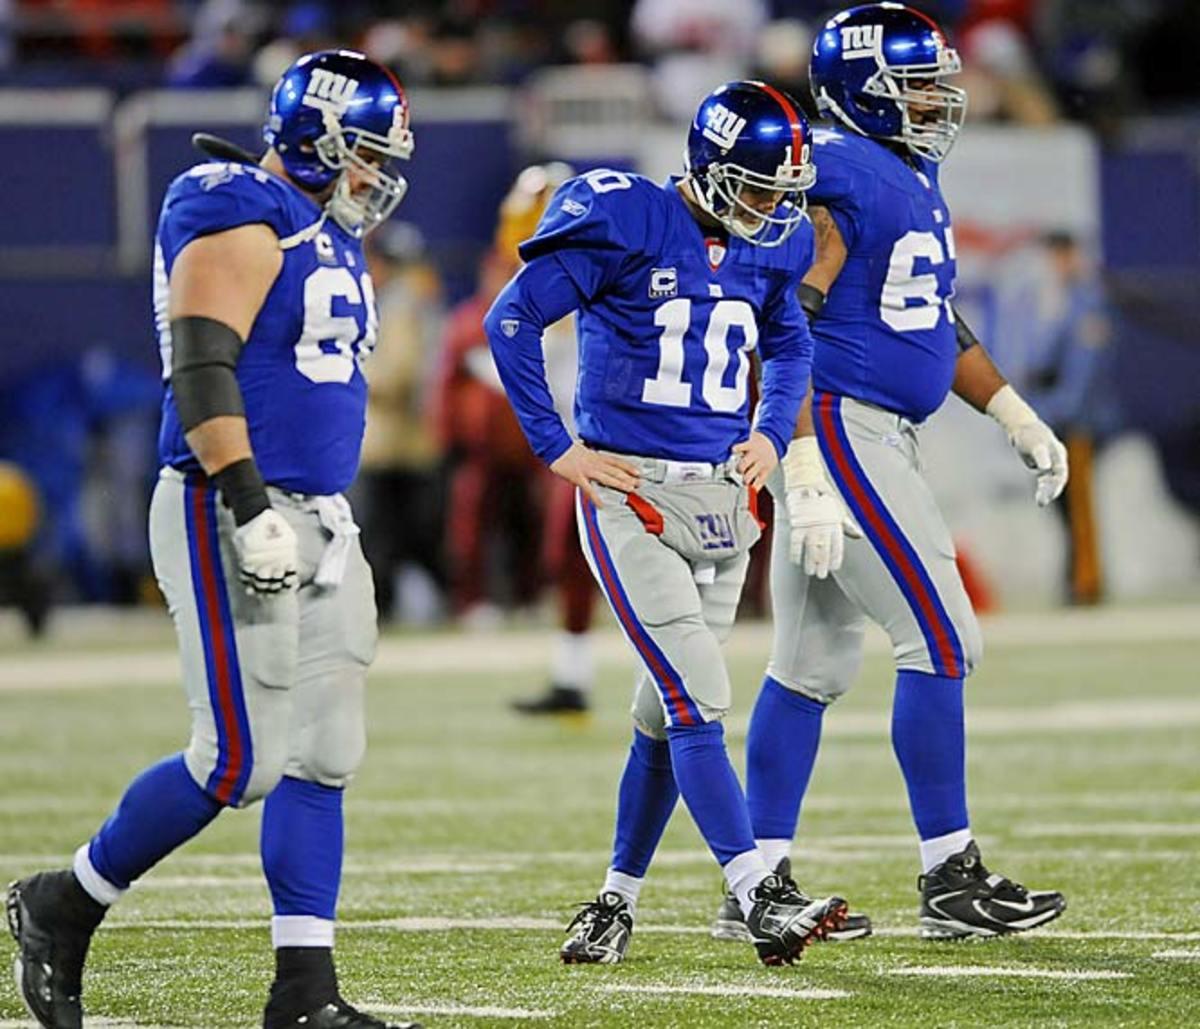 Redskins 22, Giants 10